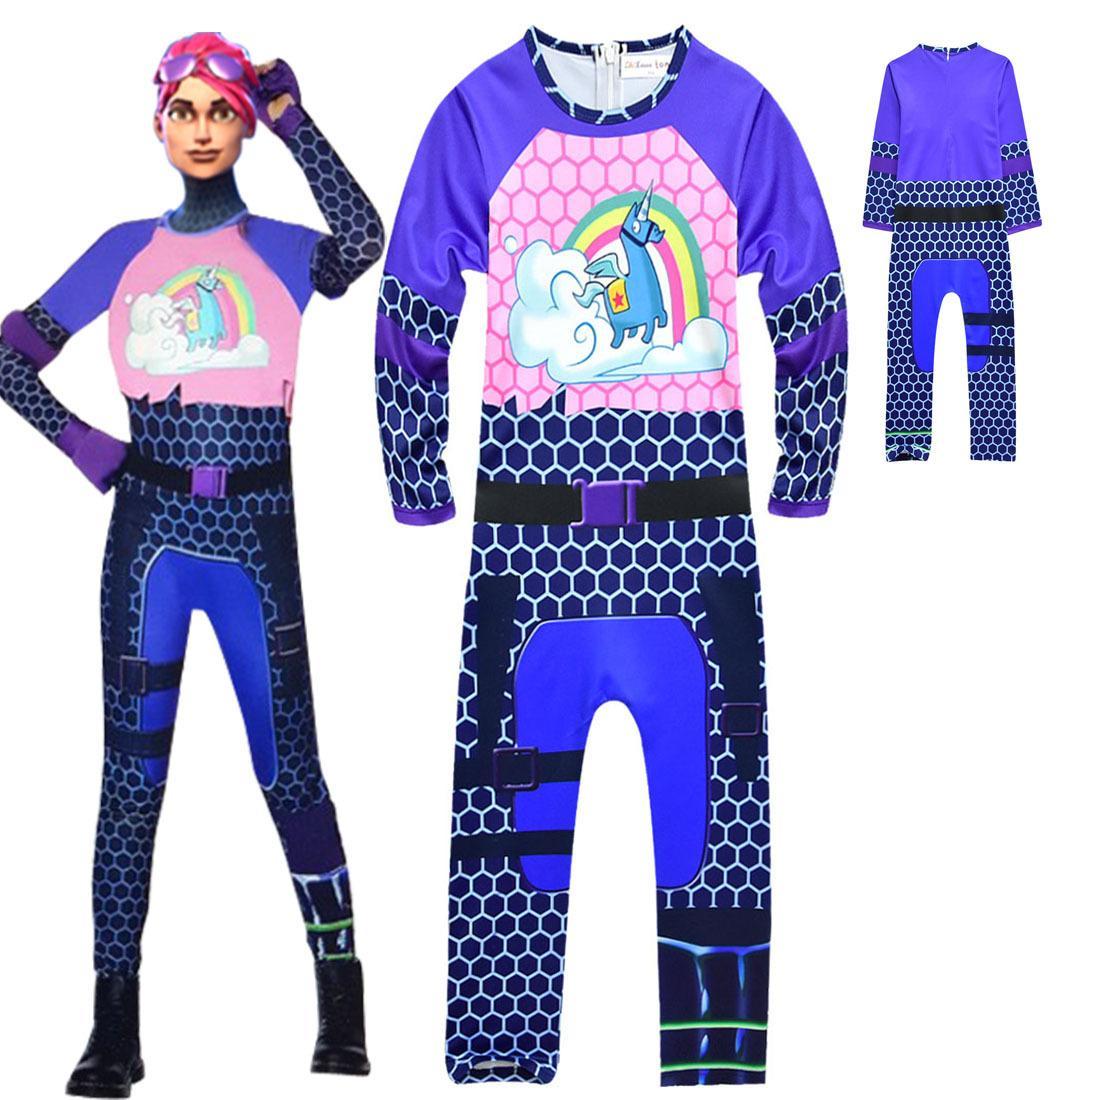 Ins Girls Fortnite Unicorn Jumpsuit Game Fortnite Cosplay Big Child Purple Printed Halloween ...